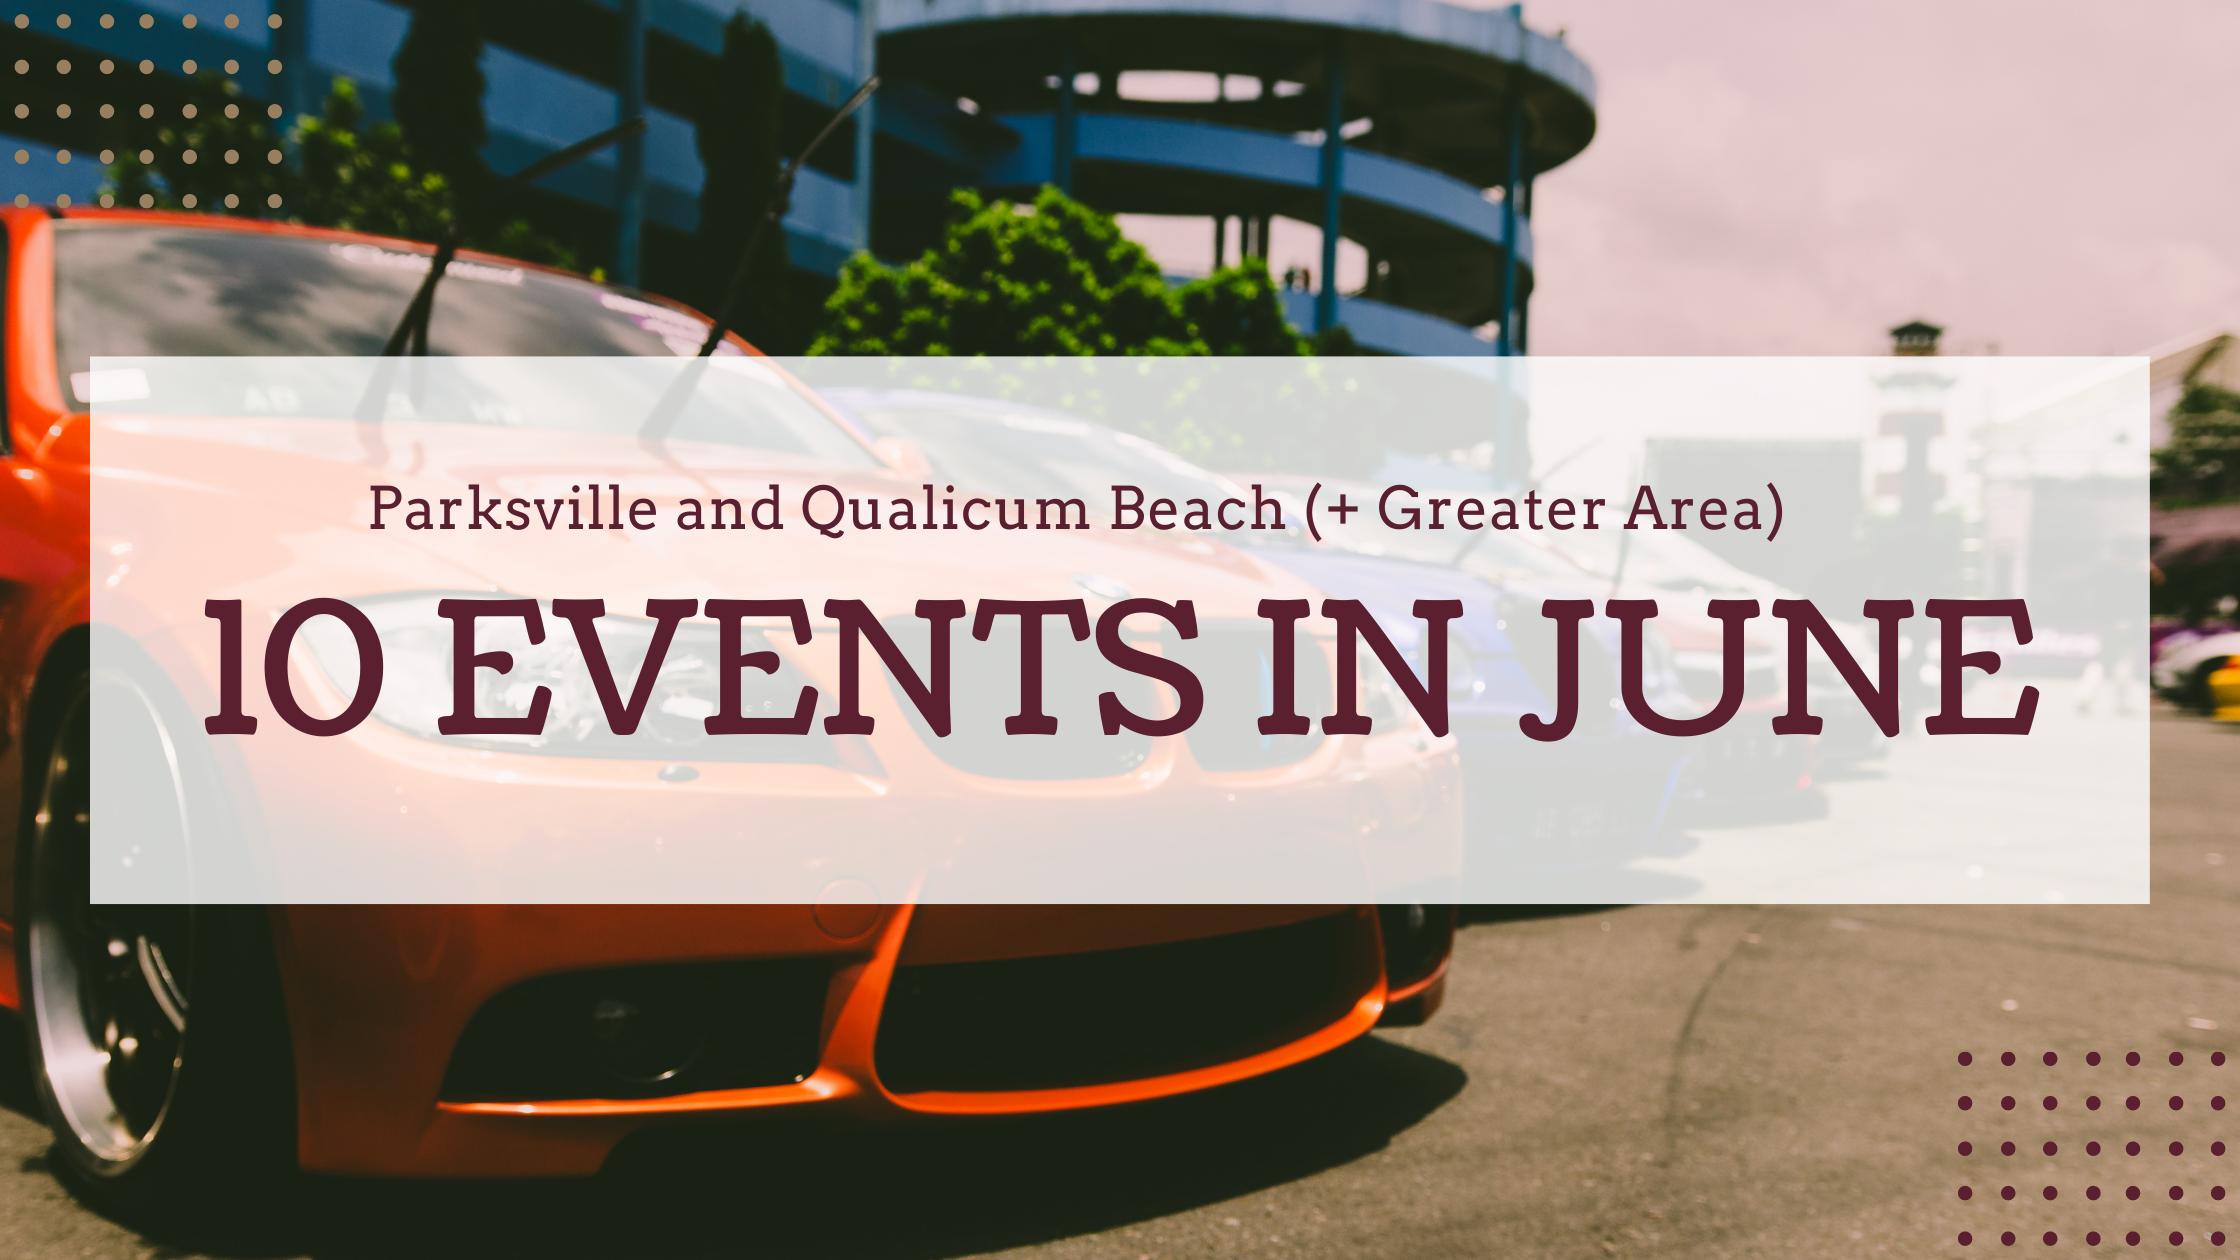 Parksville and Qualicum Beach events